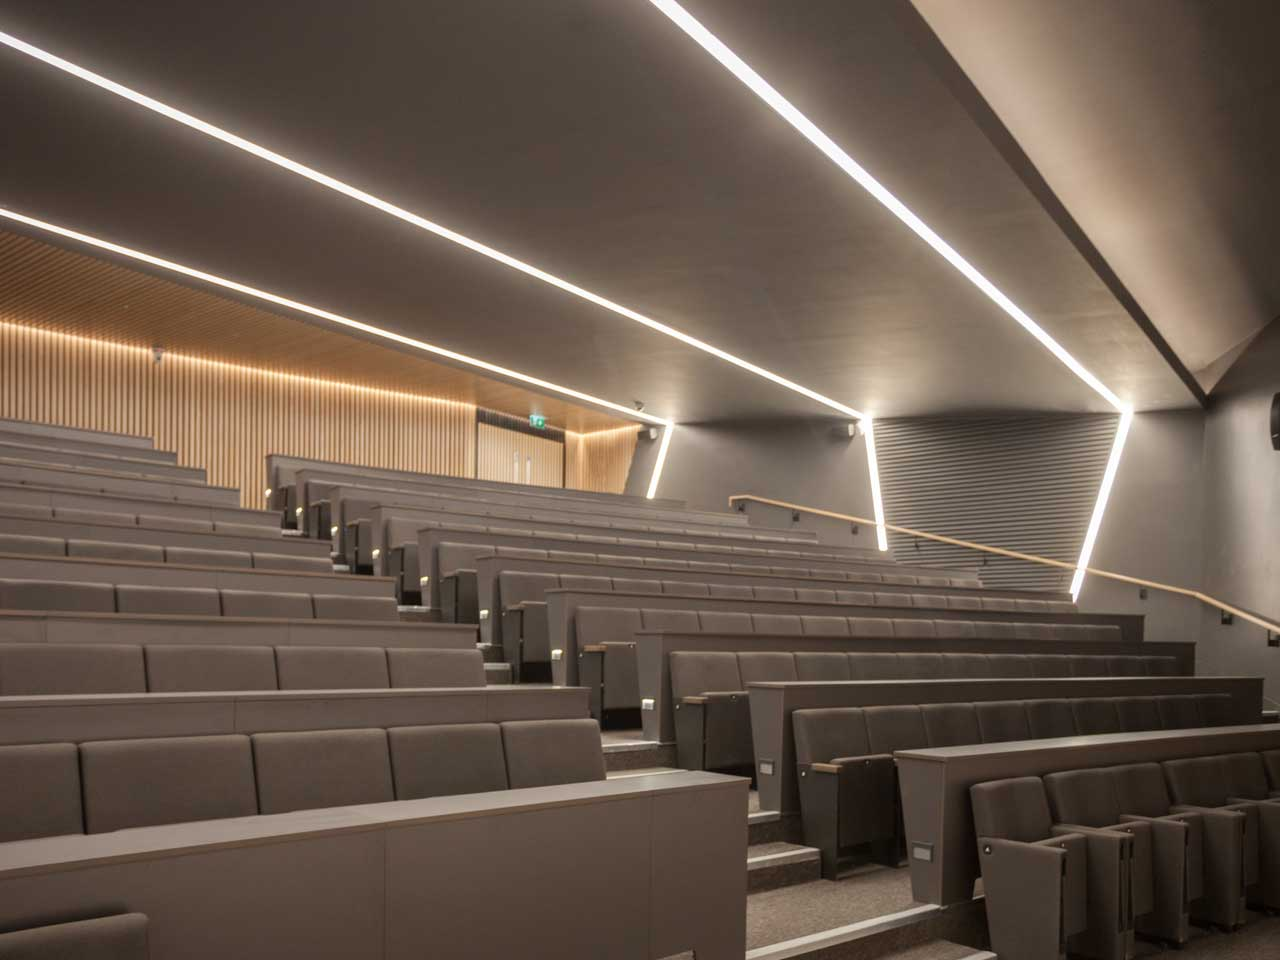 Three Regent Lighting profiles run the width of the auditorium